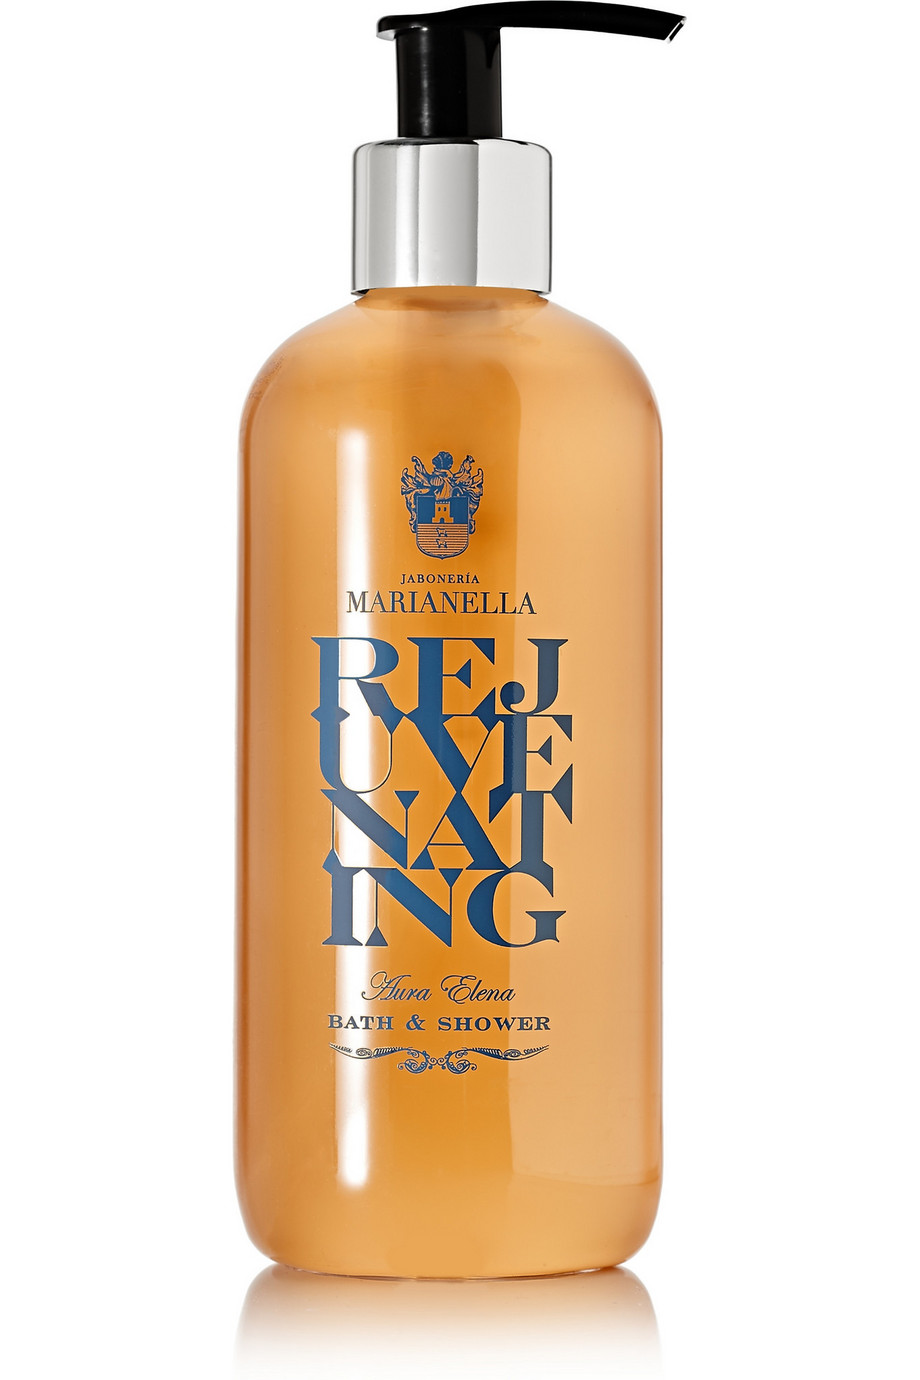 Aura Elena Rejuvenating Bath & Shower Gel, 290ml, by JABONERIA MARIANELLA